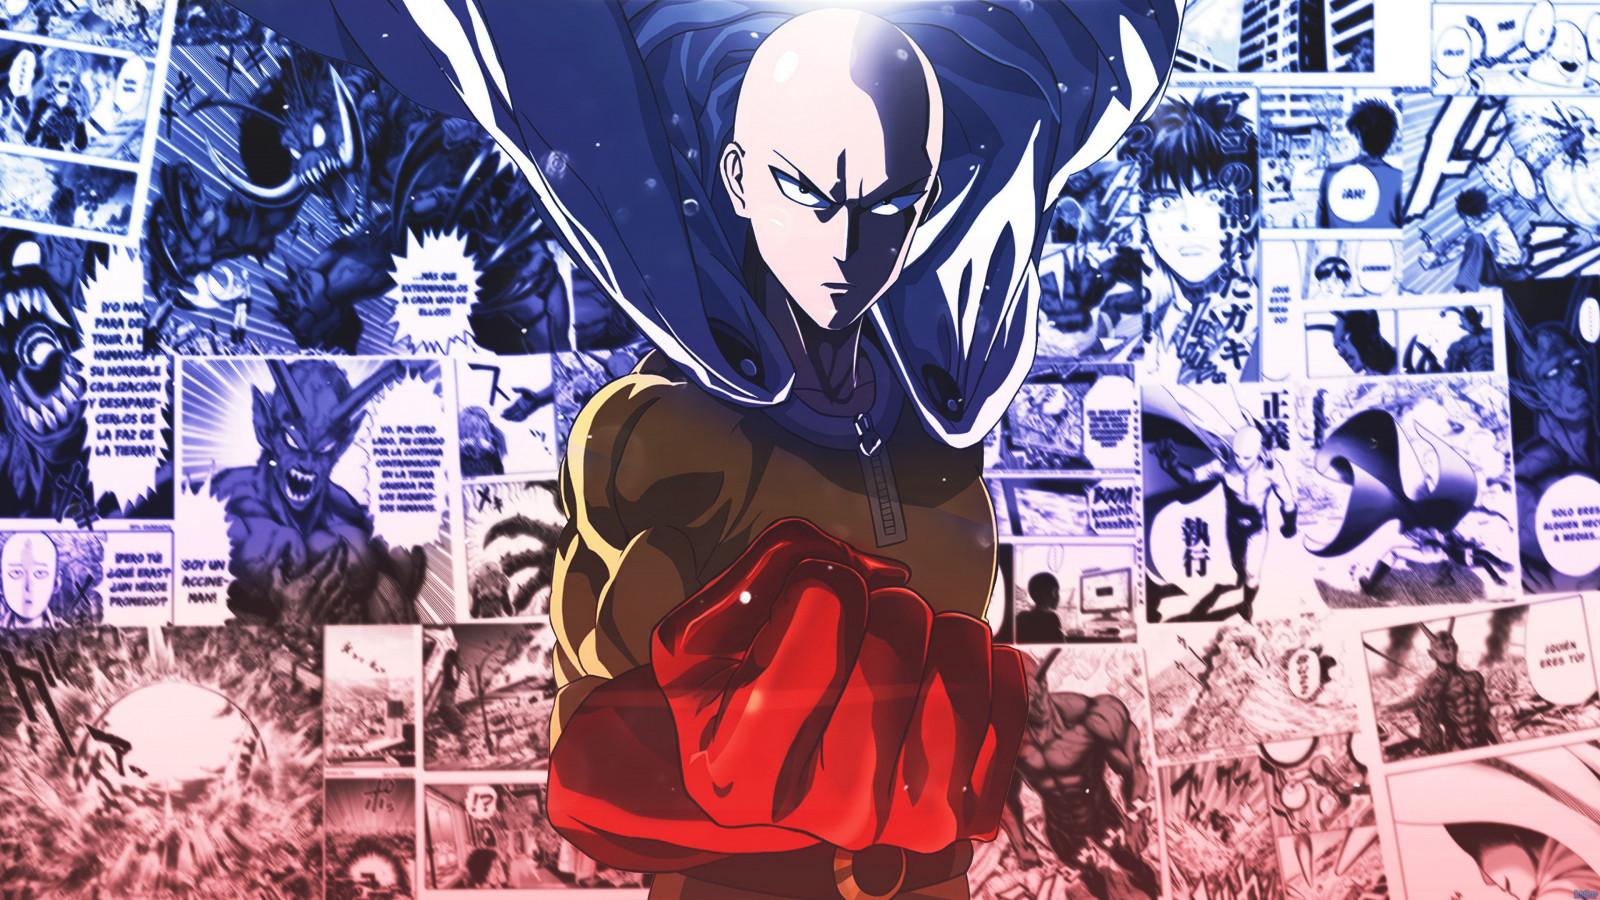 Saitama Wallpaper One Punch Man - Wallpaper : Saitama, One Punch Man, anime 3840x2160 ...